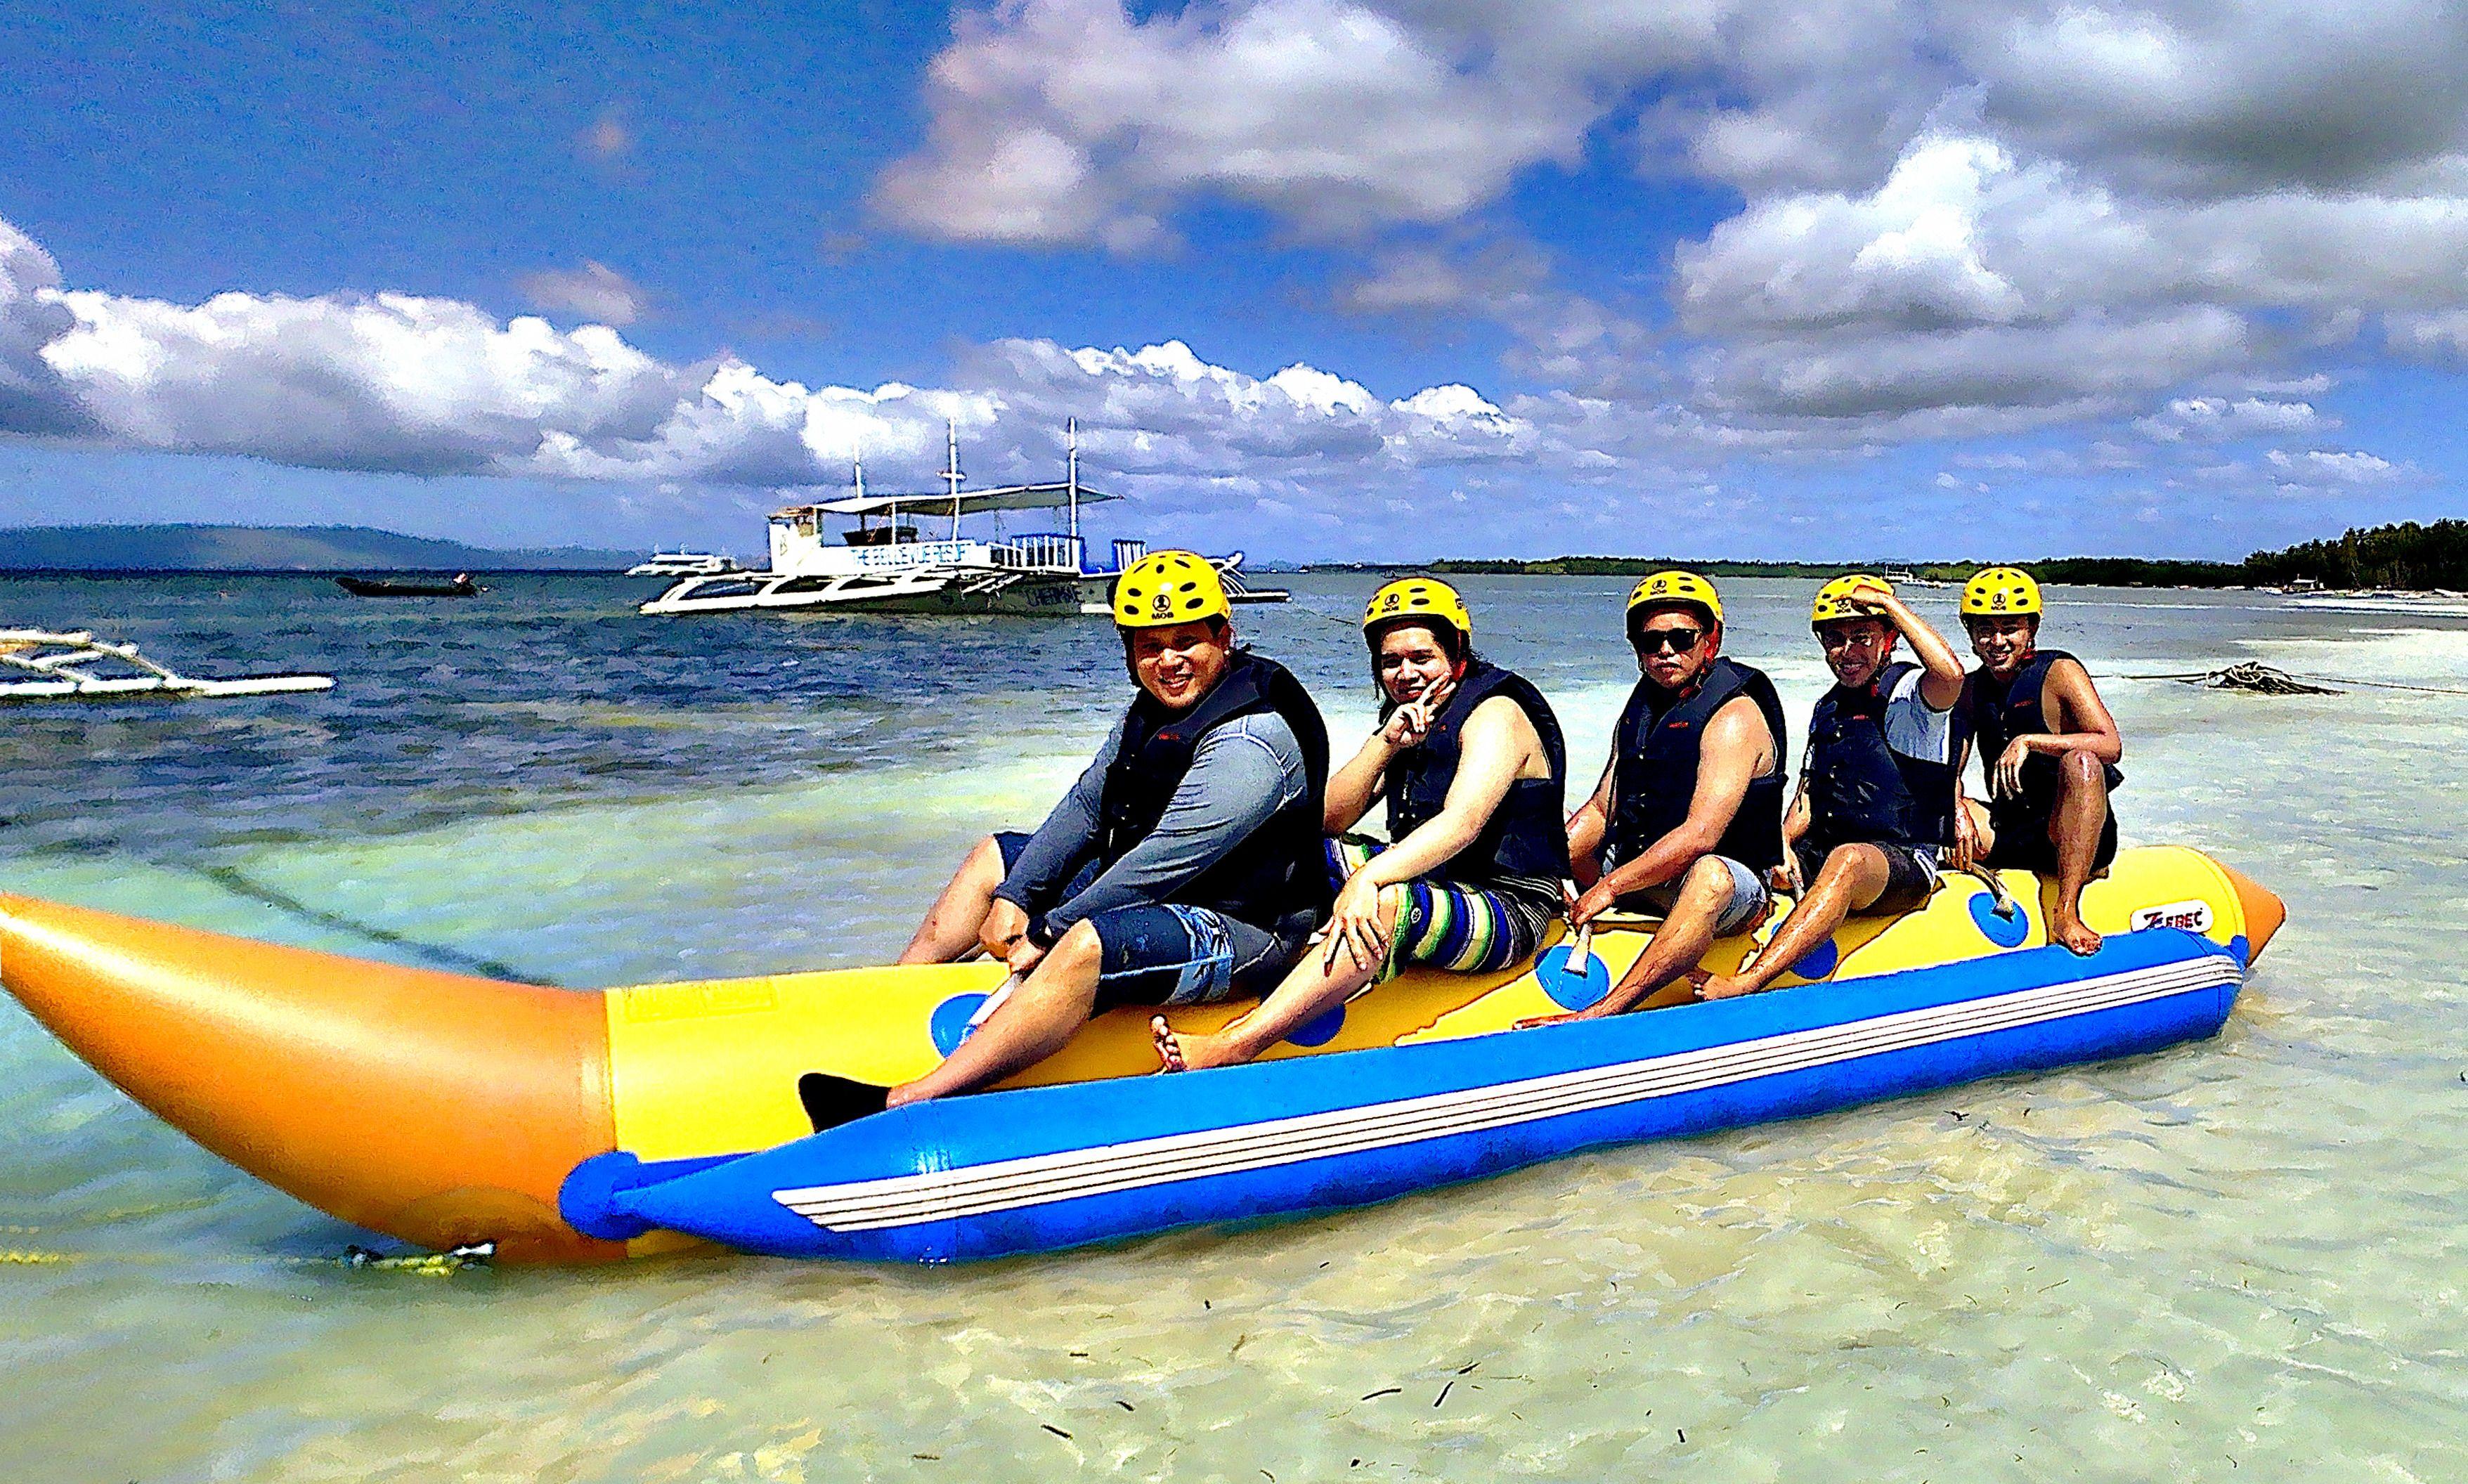 Banana Boat Ride In Bohol Banana Boat Tow Boat Boat